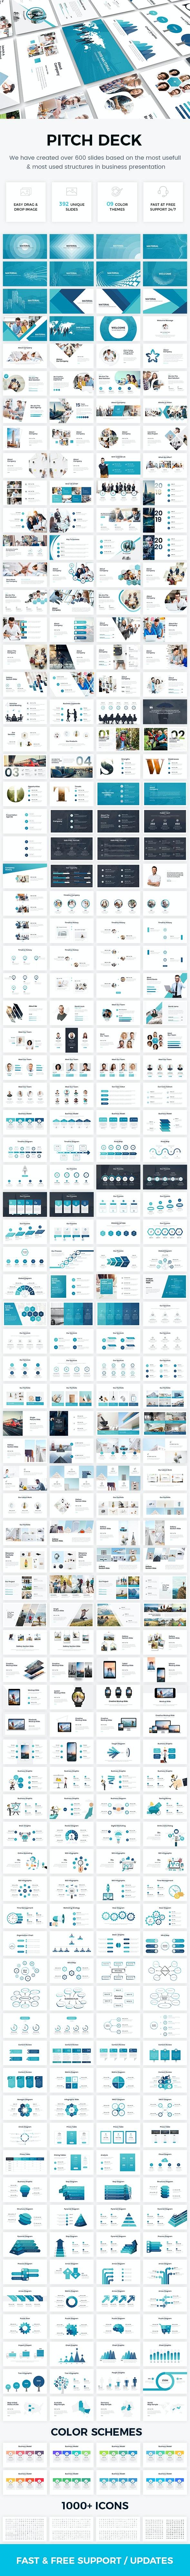 Bundle 2 in 1 Startup Pitch Deck Keynote Template - Business Keynote Templates